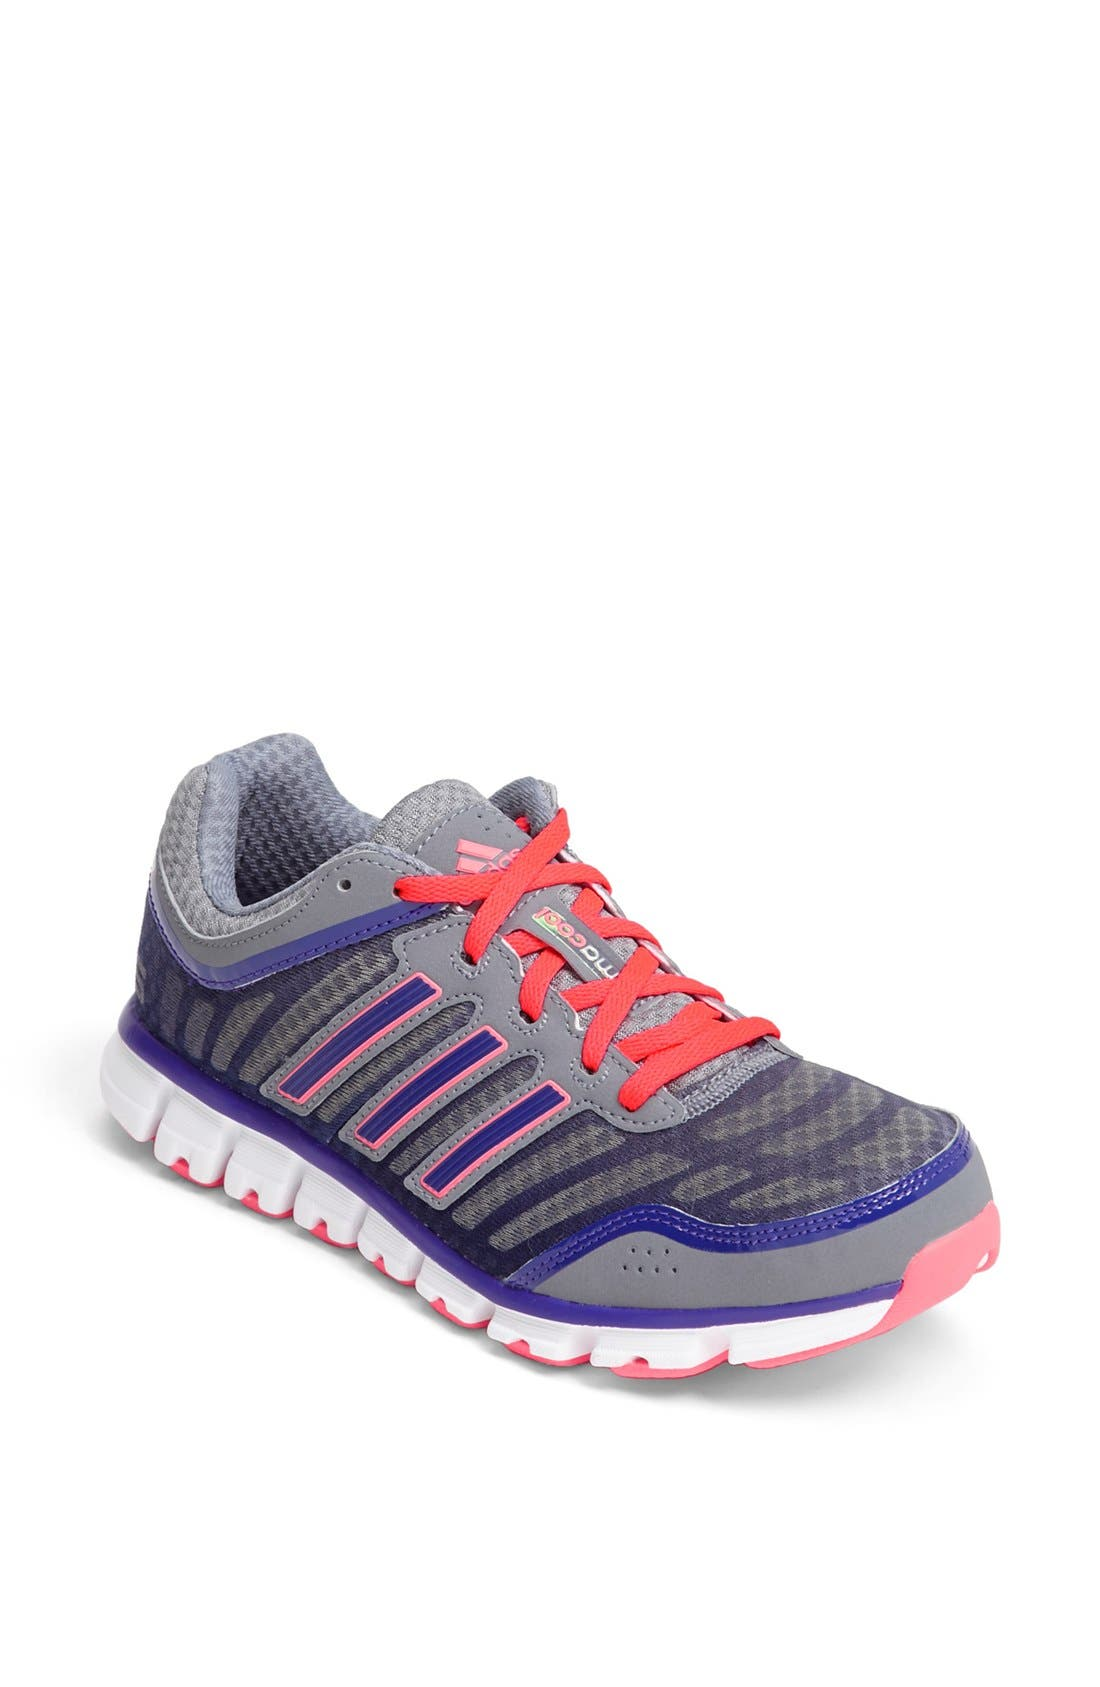 Main Image - adidas 'CLIMACOOL® Aerate' Running Shoe (Women)